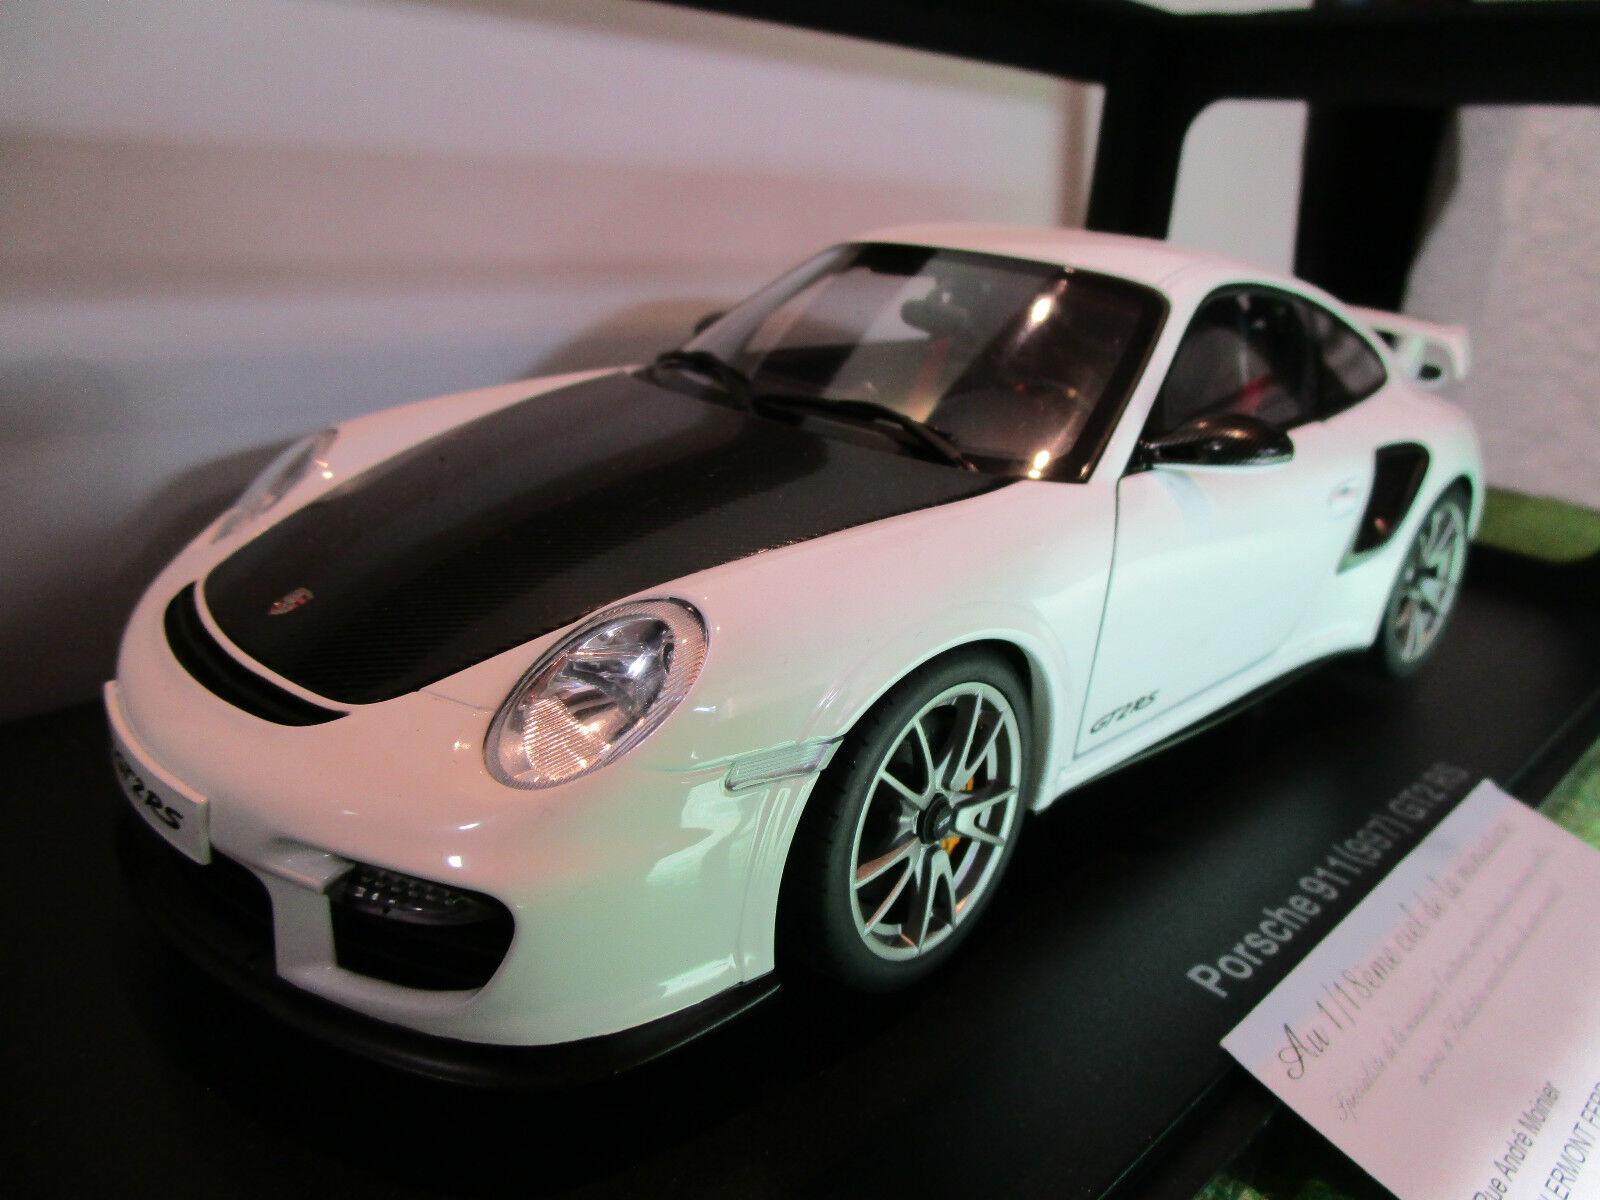 PORSCHE 911 type 997 GT2 RS blnc 1 18 AUTOART 77963 voiture miniature collection